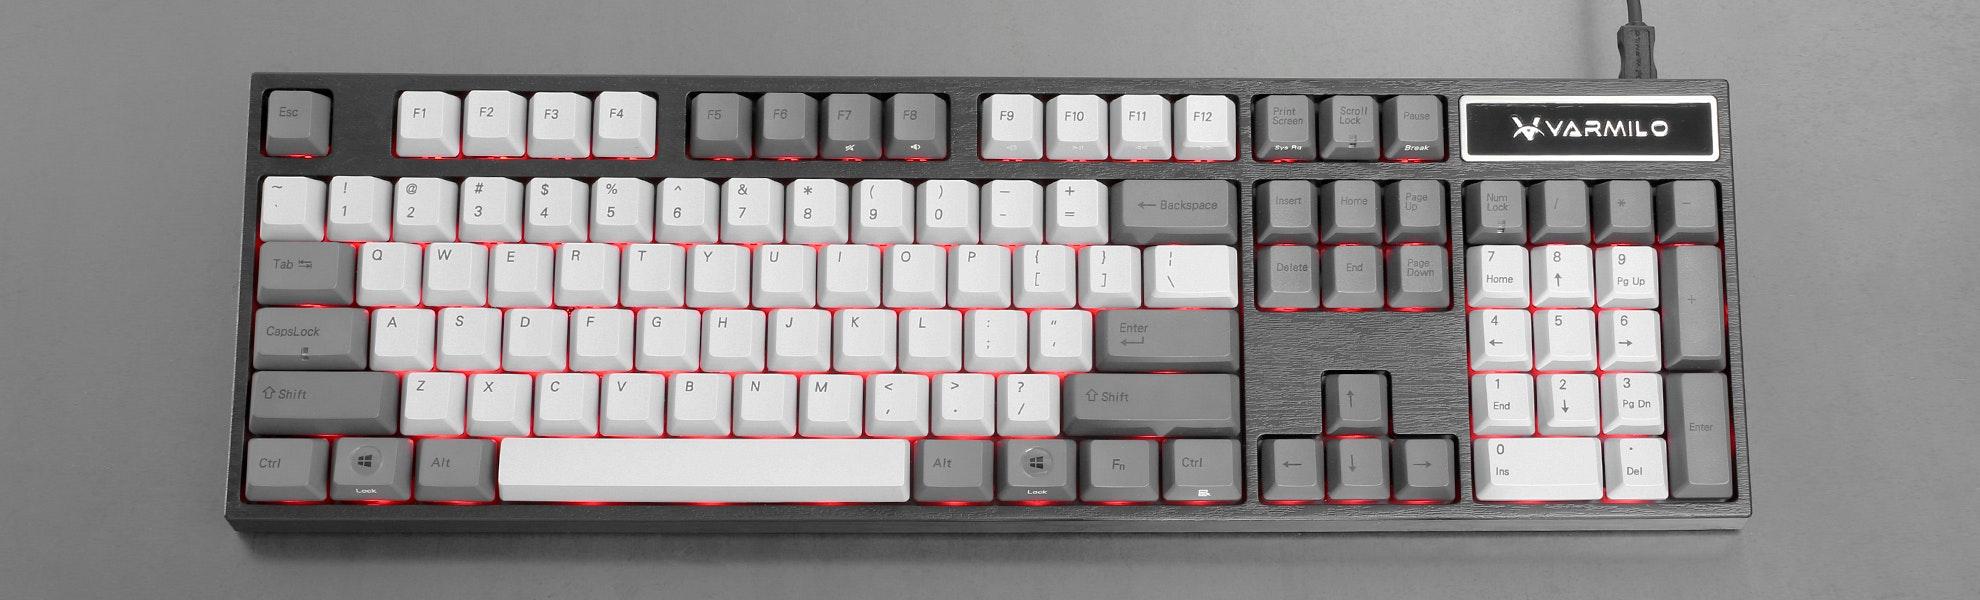 Varmilo VA104 Full Size Mechanical Keyboard